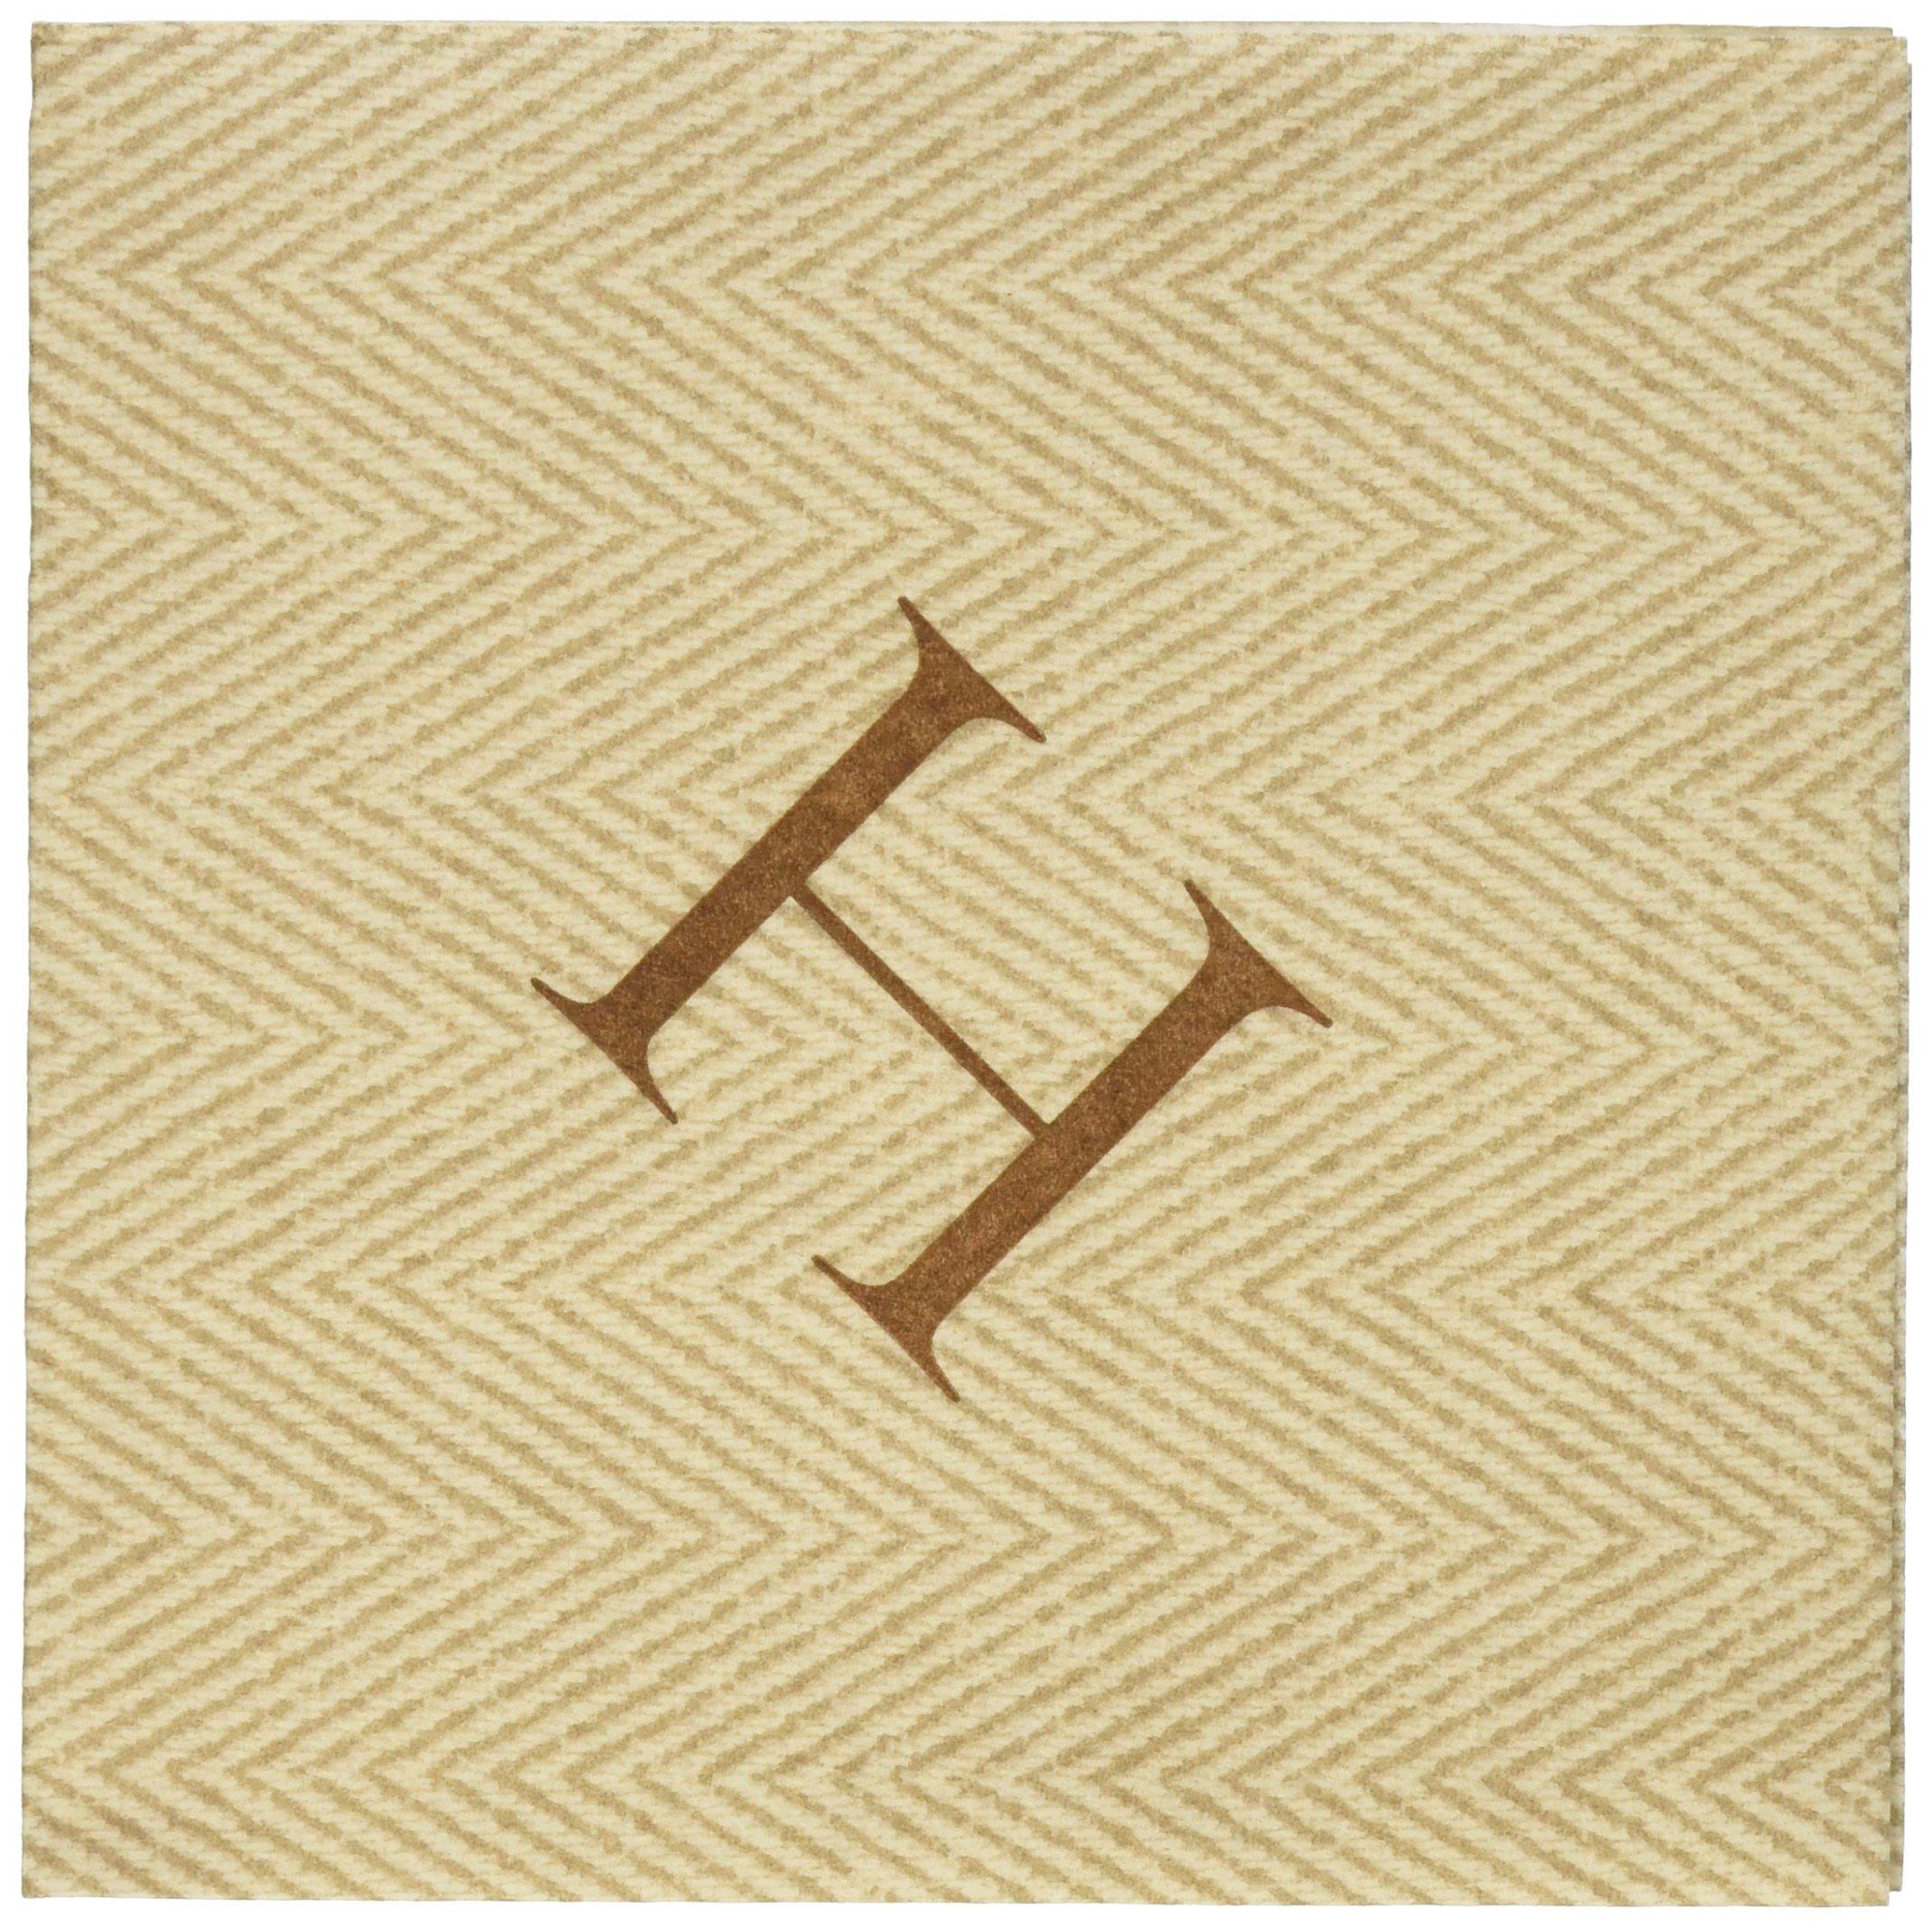 Entertaining with Caspari Jute Herringbone Paper Linen Cocktail Napkins, Monogram Initial H, Pack of 30